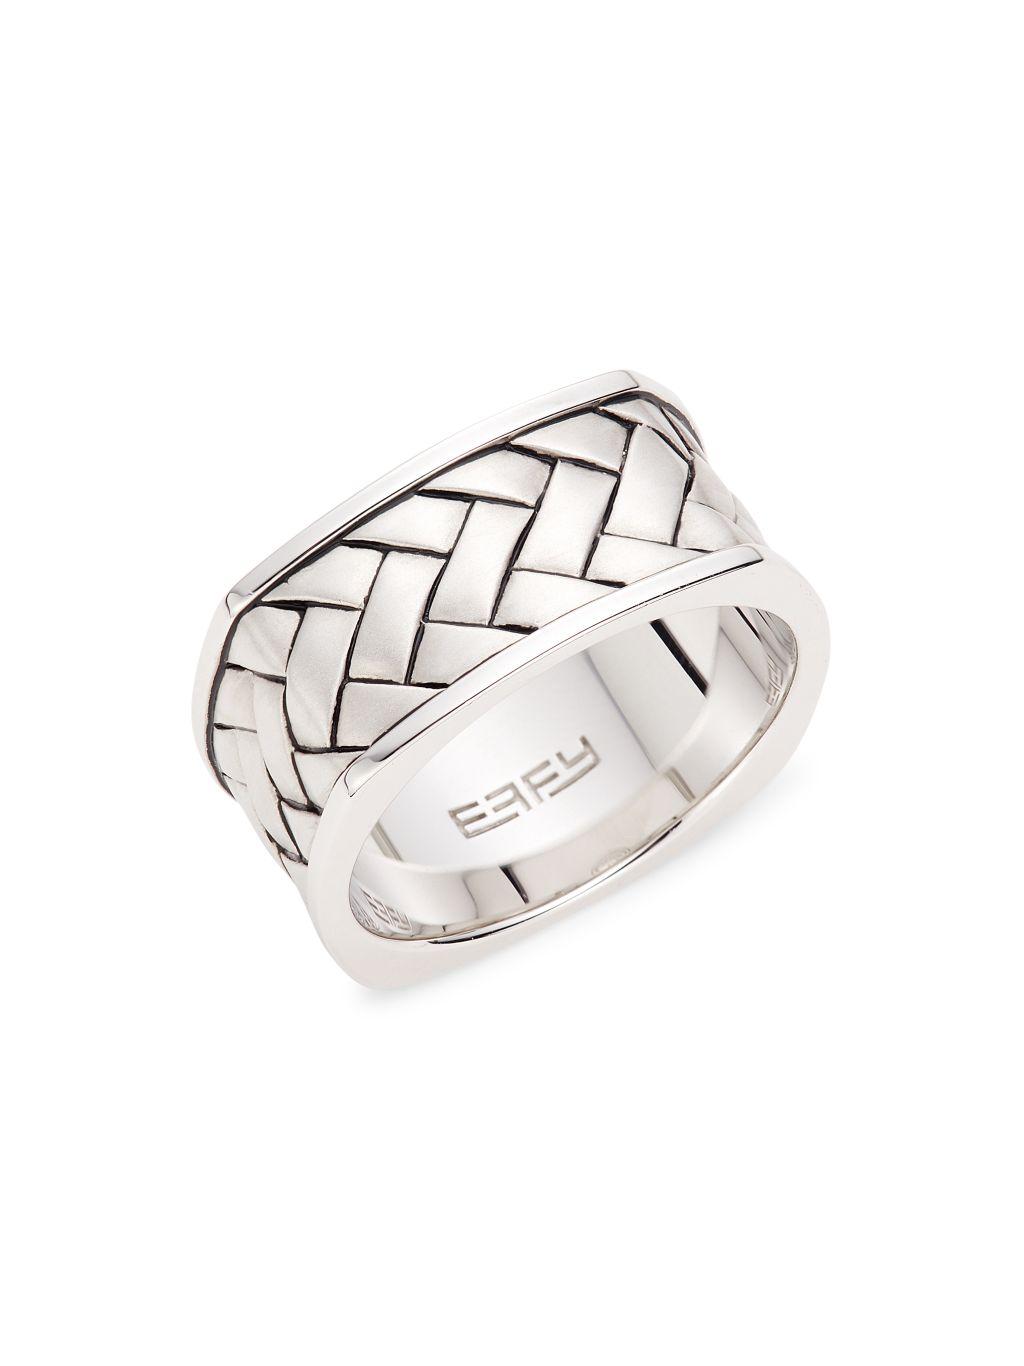 Effy Sterling Silver Band Ring